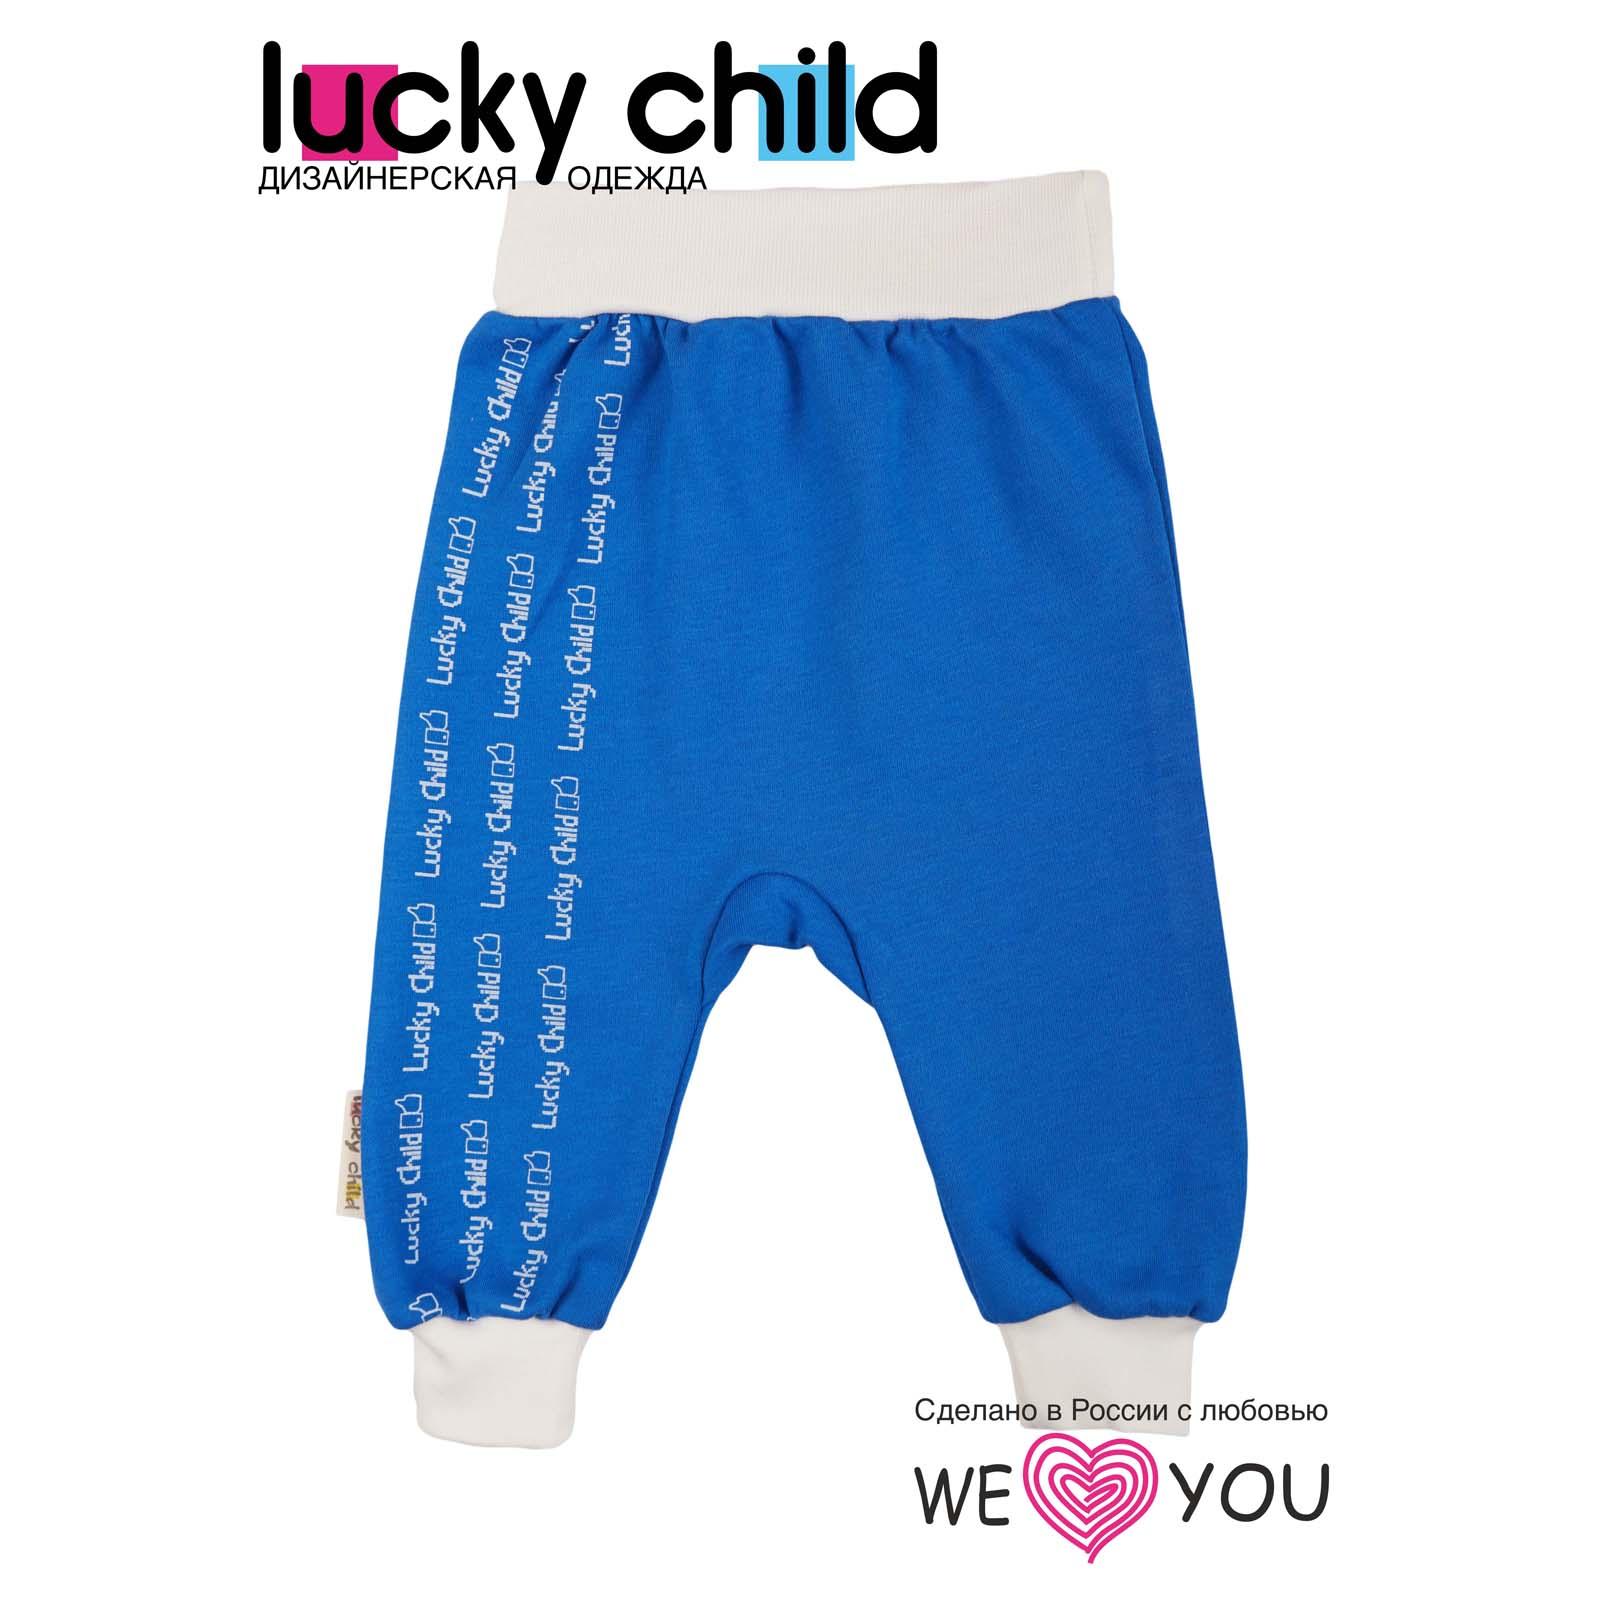 Штанишки Lucky Child, коллекция Интернет, цвет синий с белым размер 62<br>